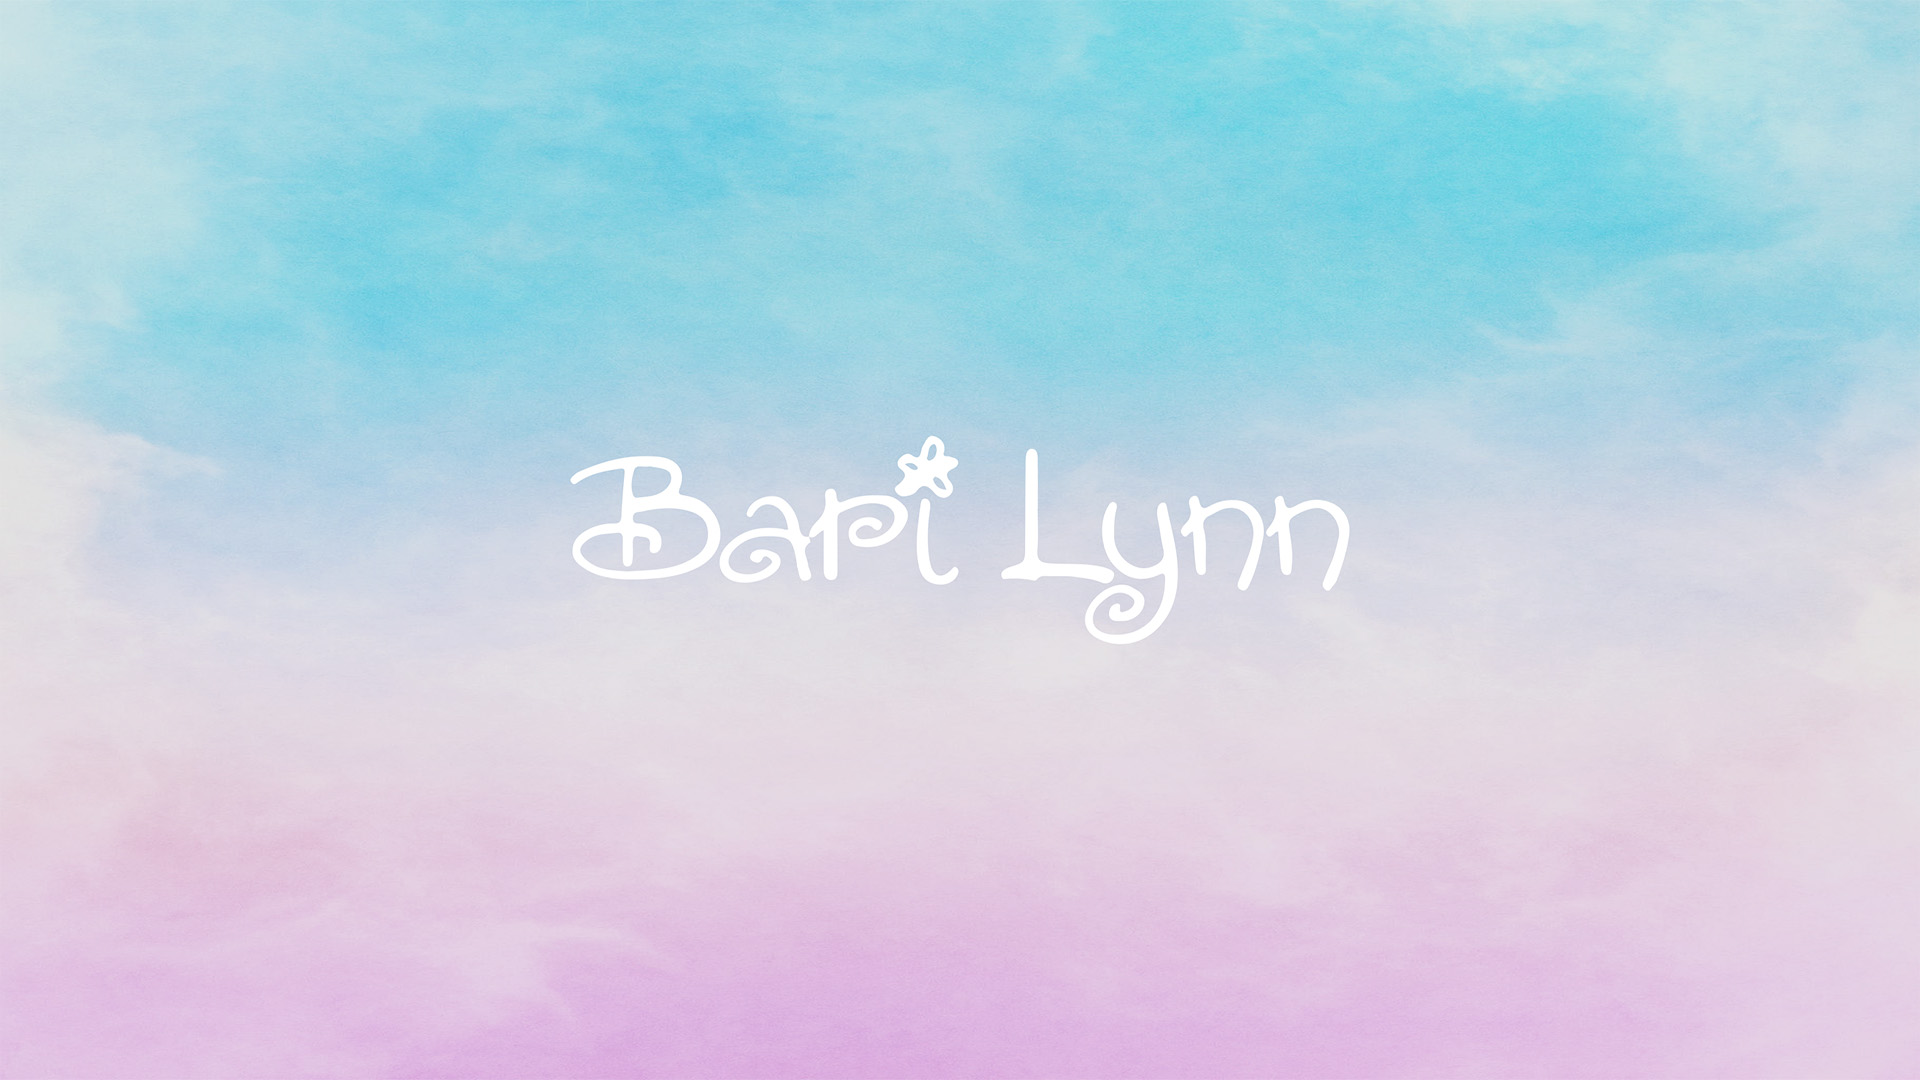 Bari Lynn Brand Banner - Kids Curated Apparel